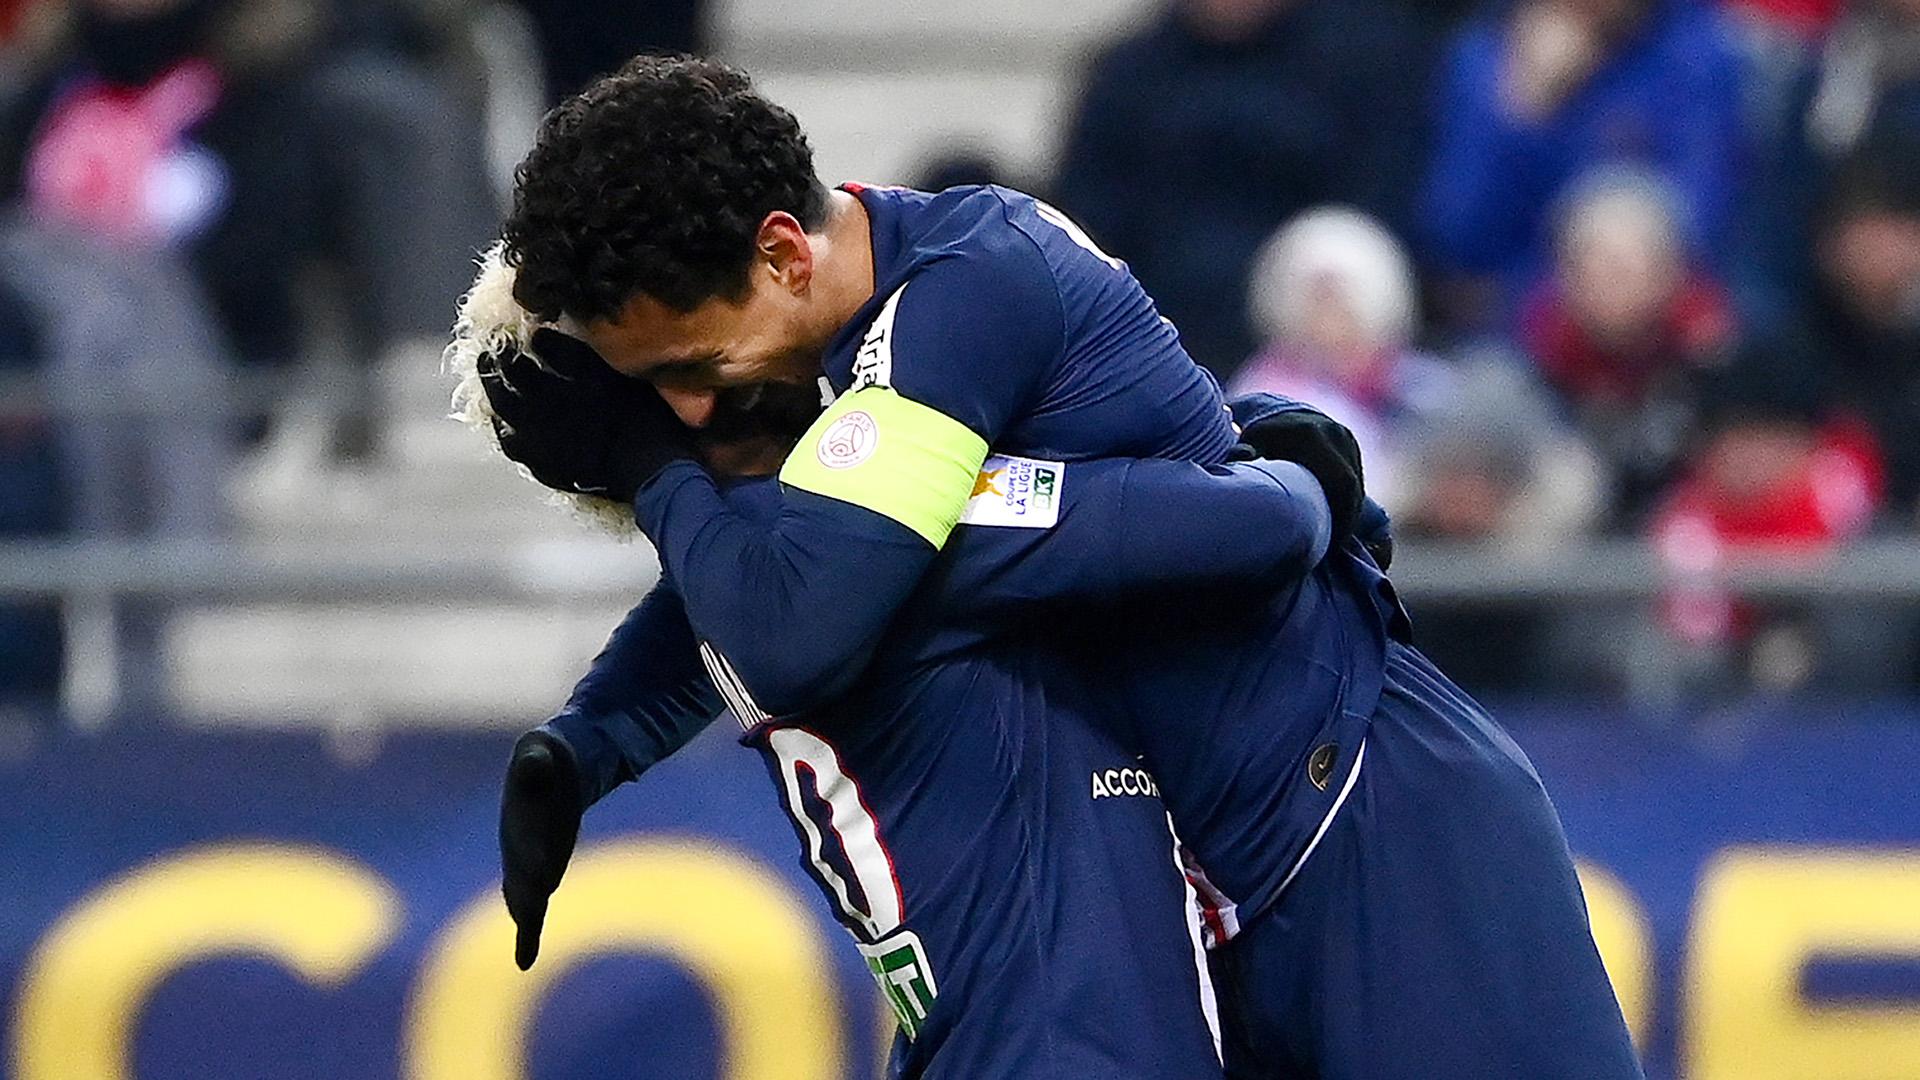 Marquinhos is Paris Saint-Germain's best player – Paulo Cesar